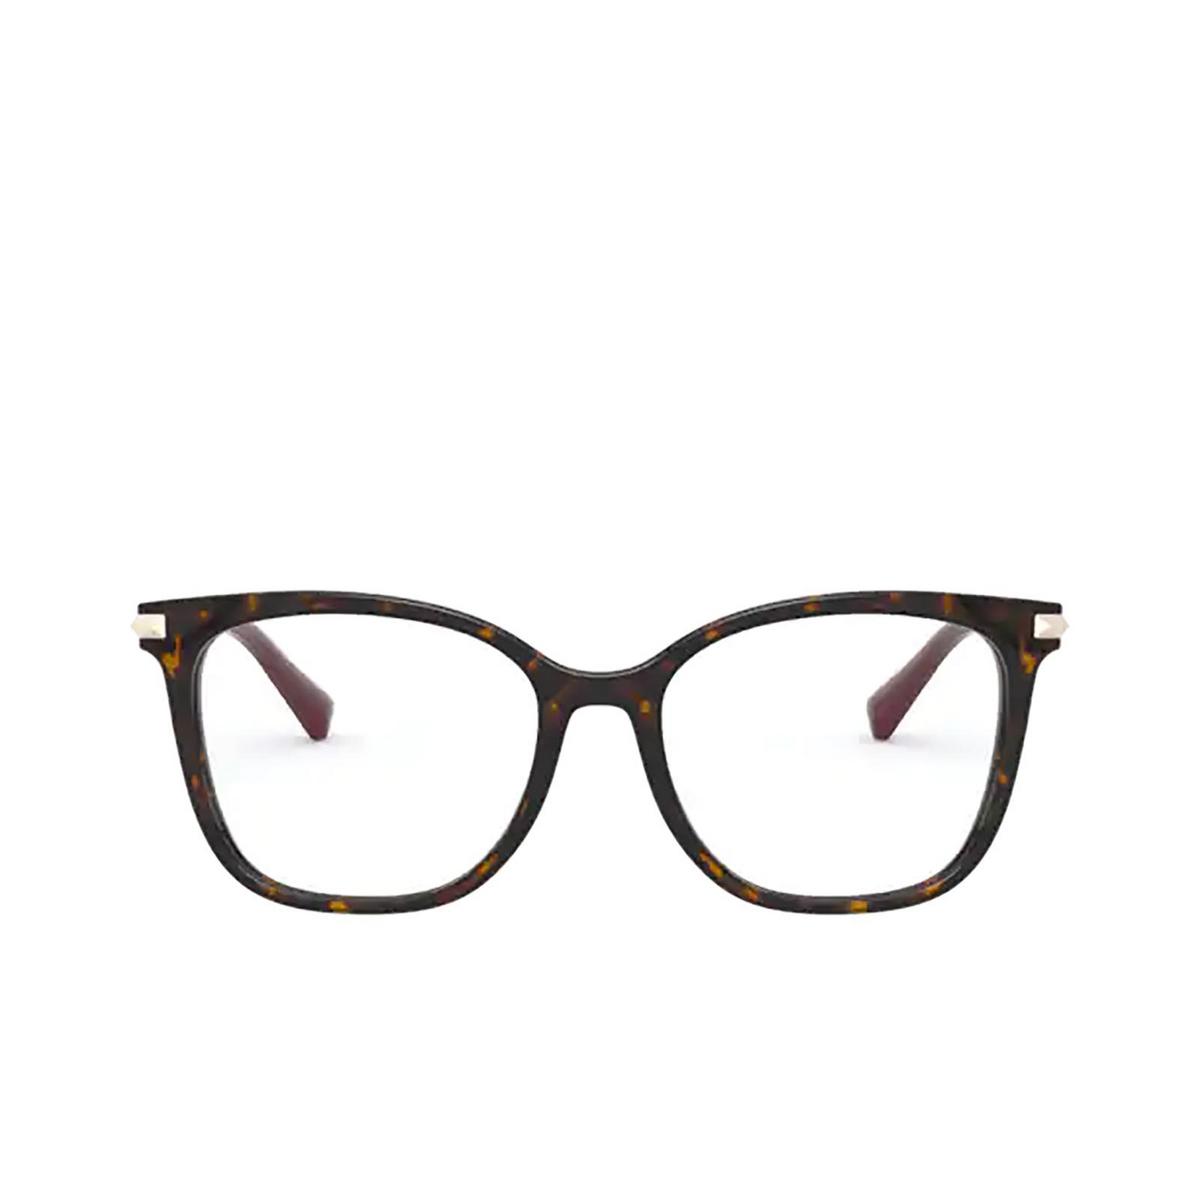 Valentino® Square Eyeglasses: VA3048 color Havana 5002 - front view.